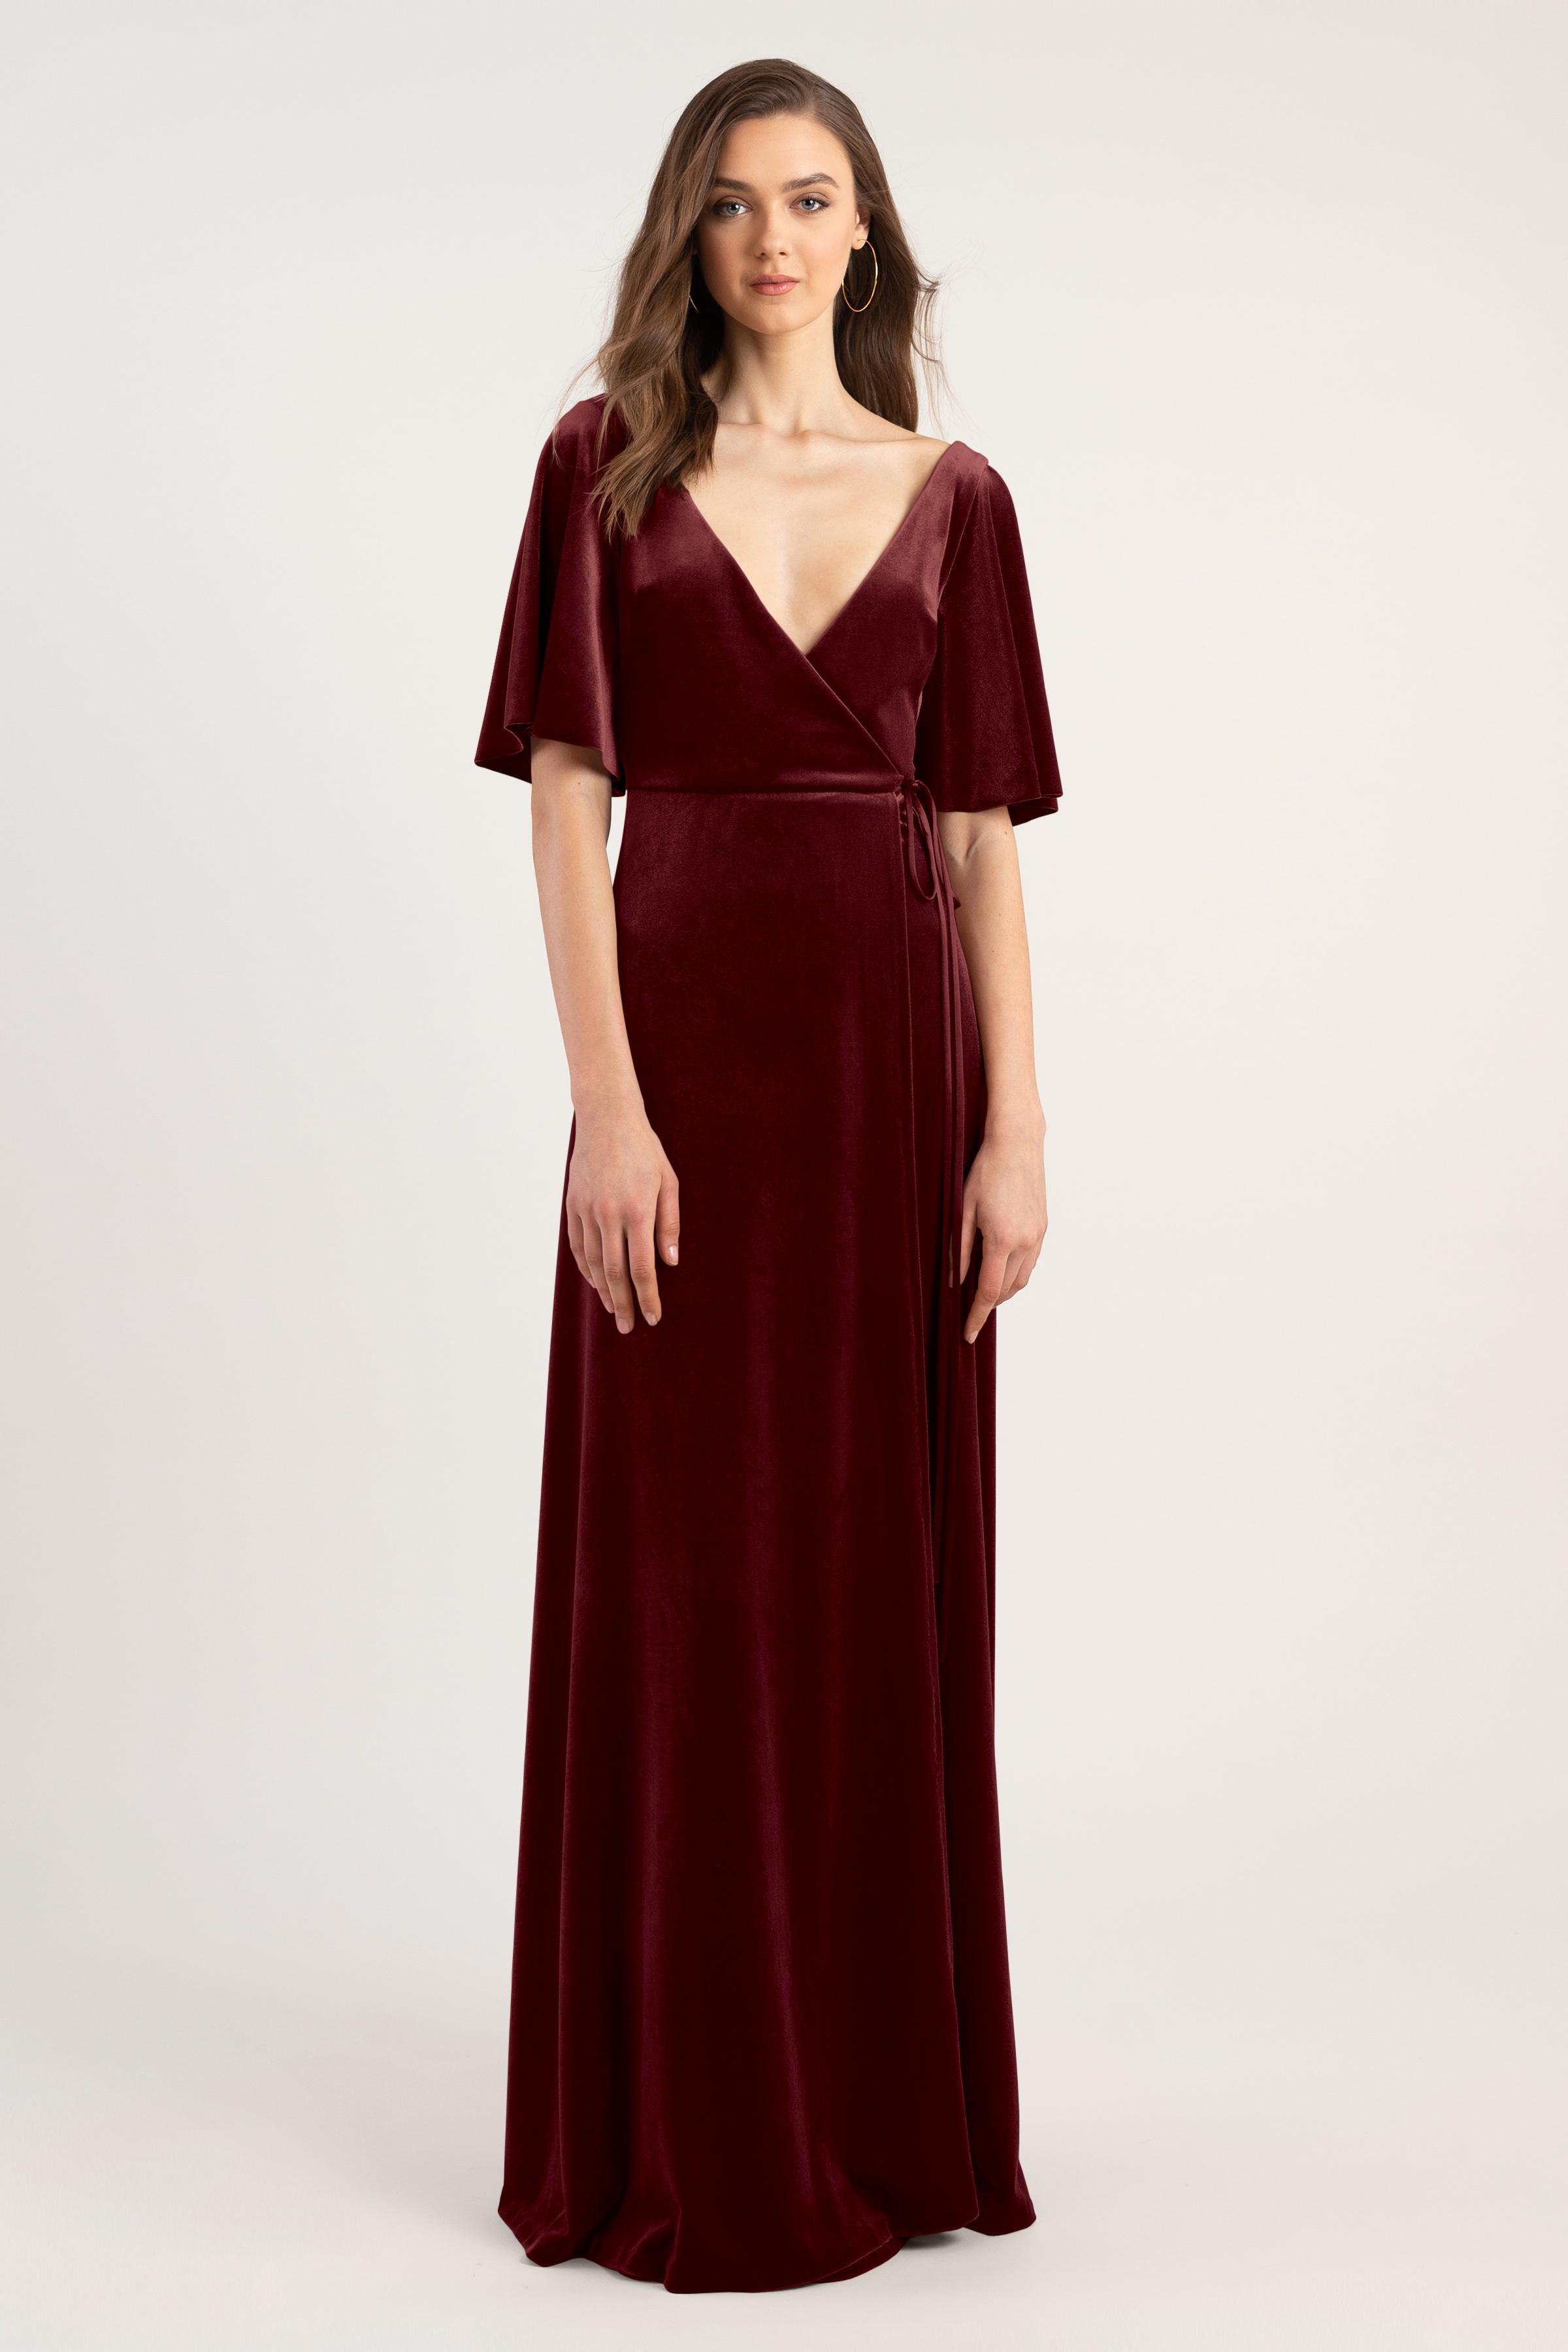 Marin Bridesmaids Dress by Jenny Yoo - Dark Berry